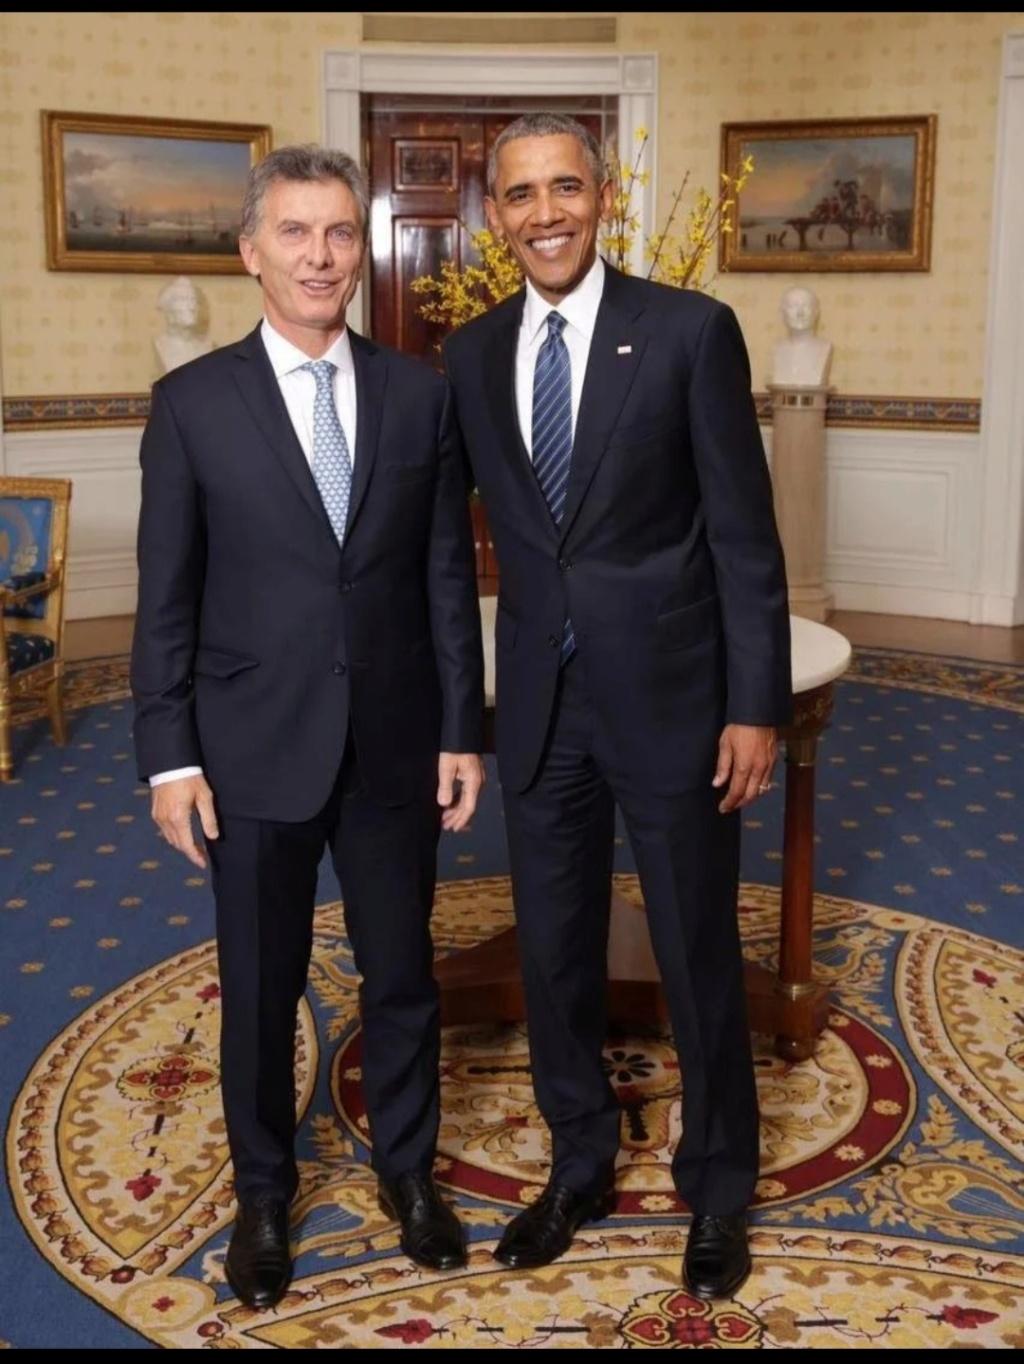 ¿Cuánto mide Mauricio Macri? - Altura - Real height Img_2189